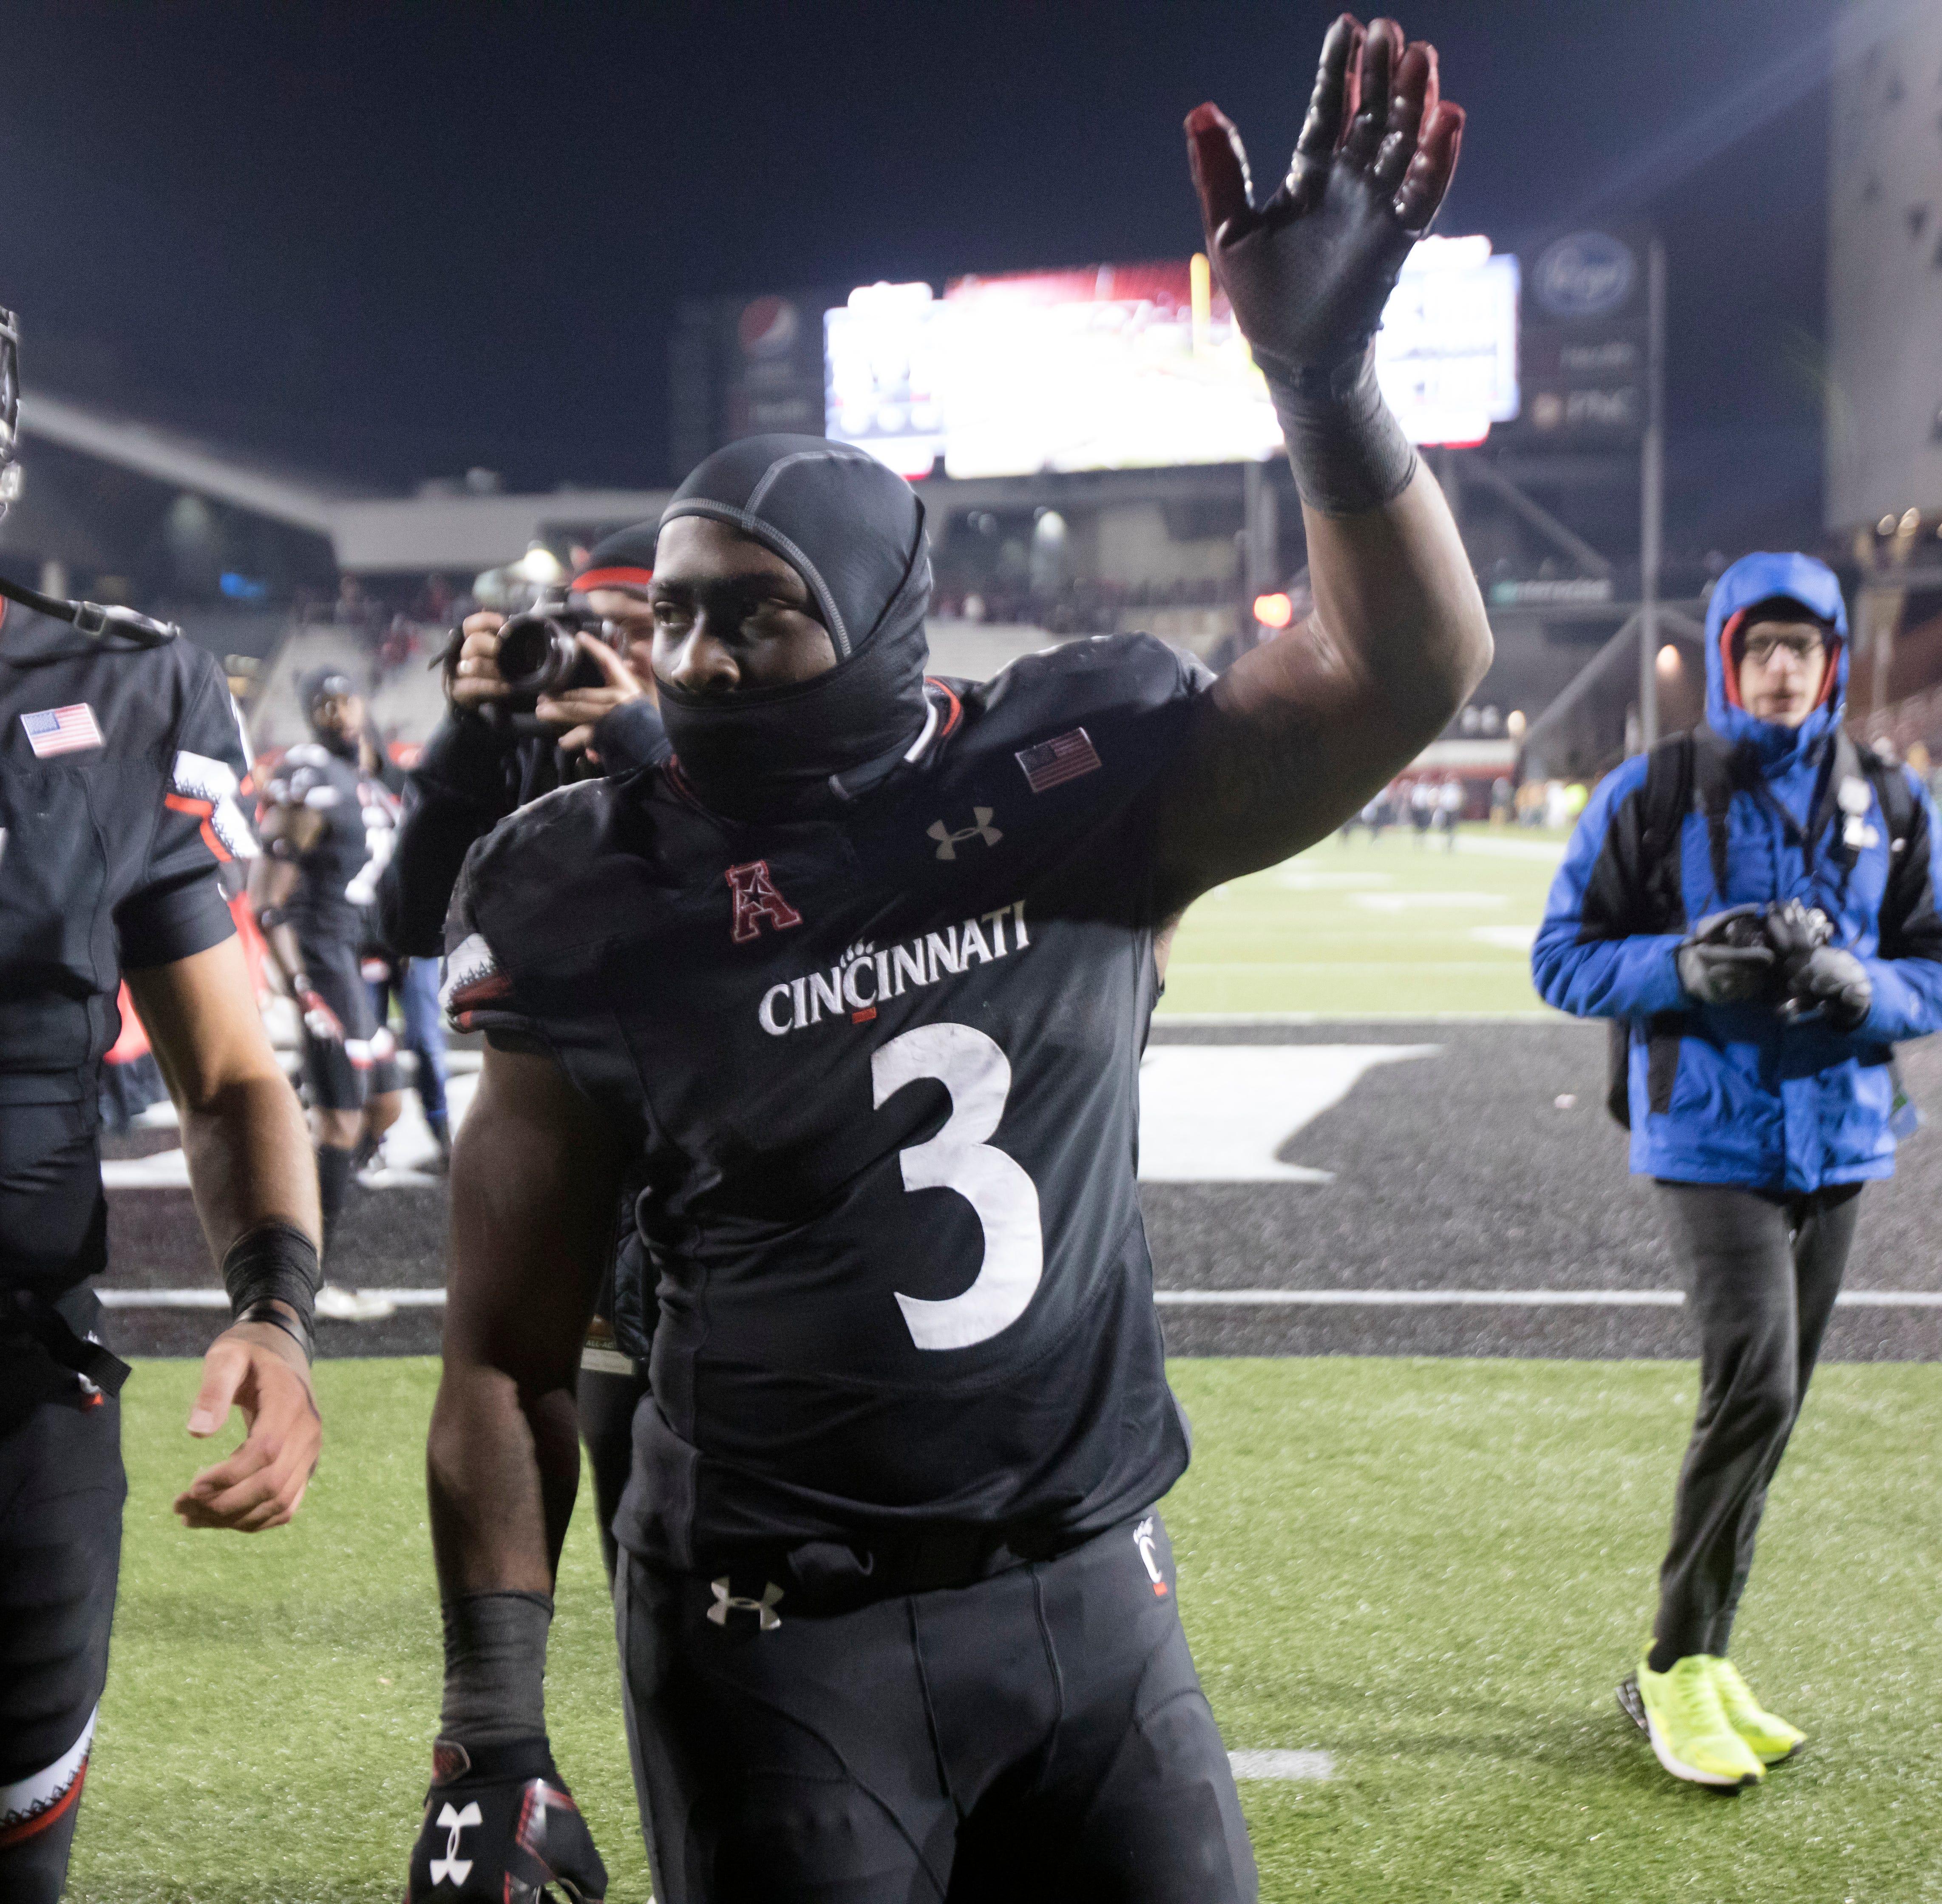 See where Cincinnati Bearcats stand in latest AAC football power rankings